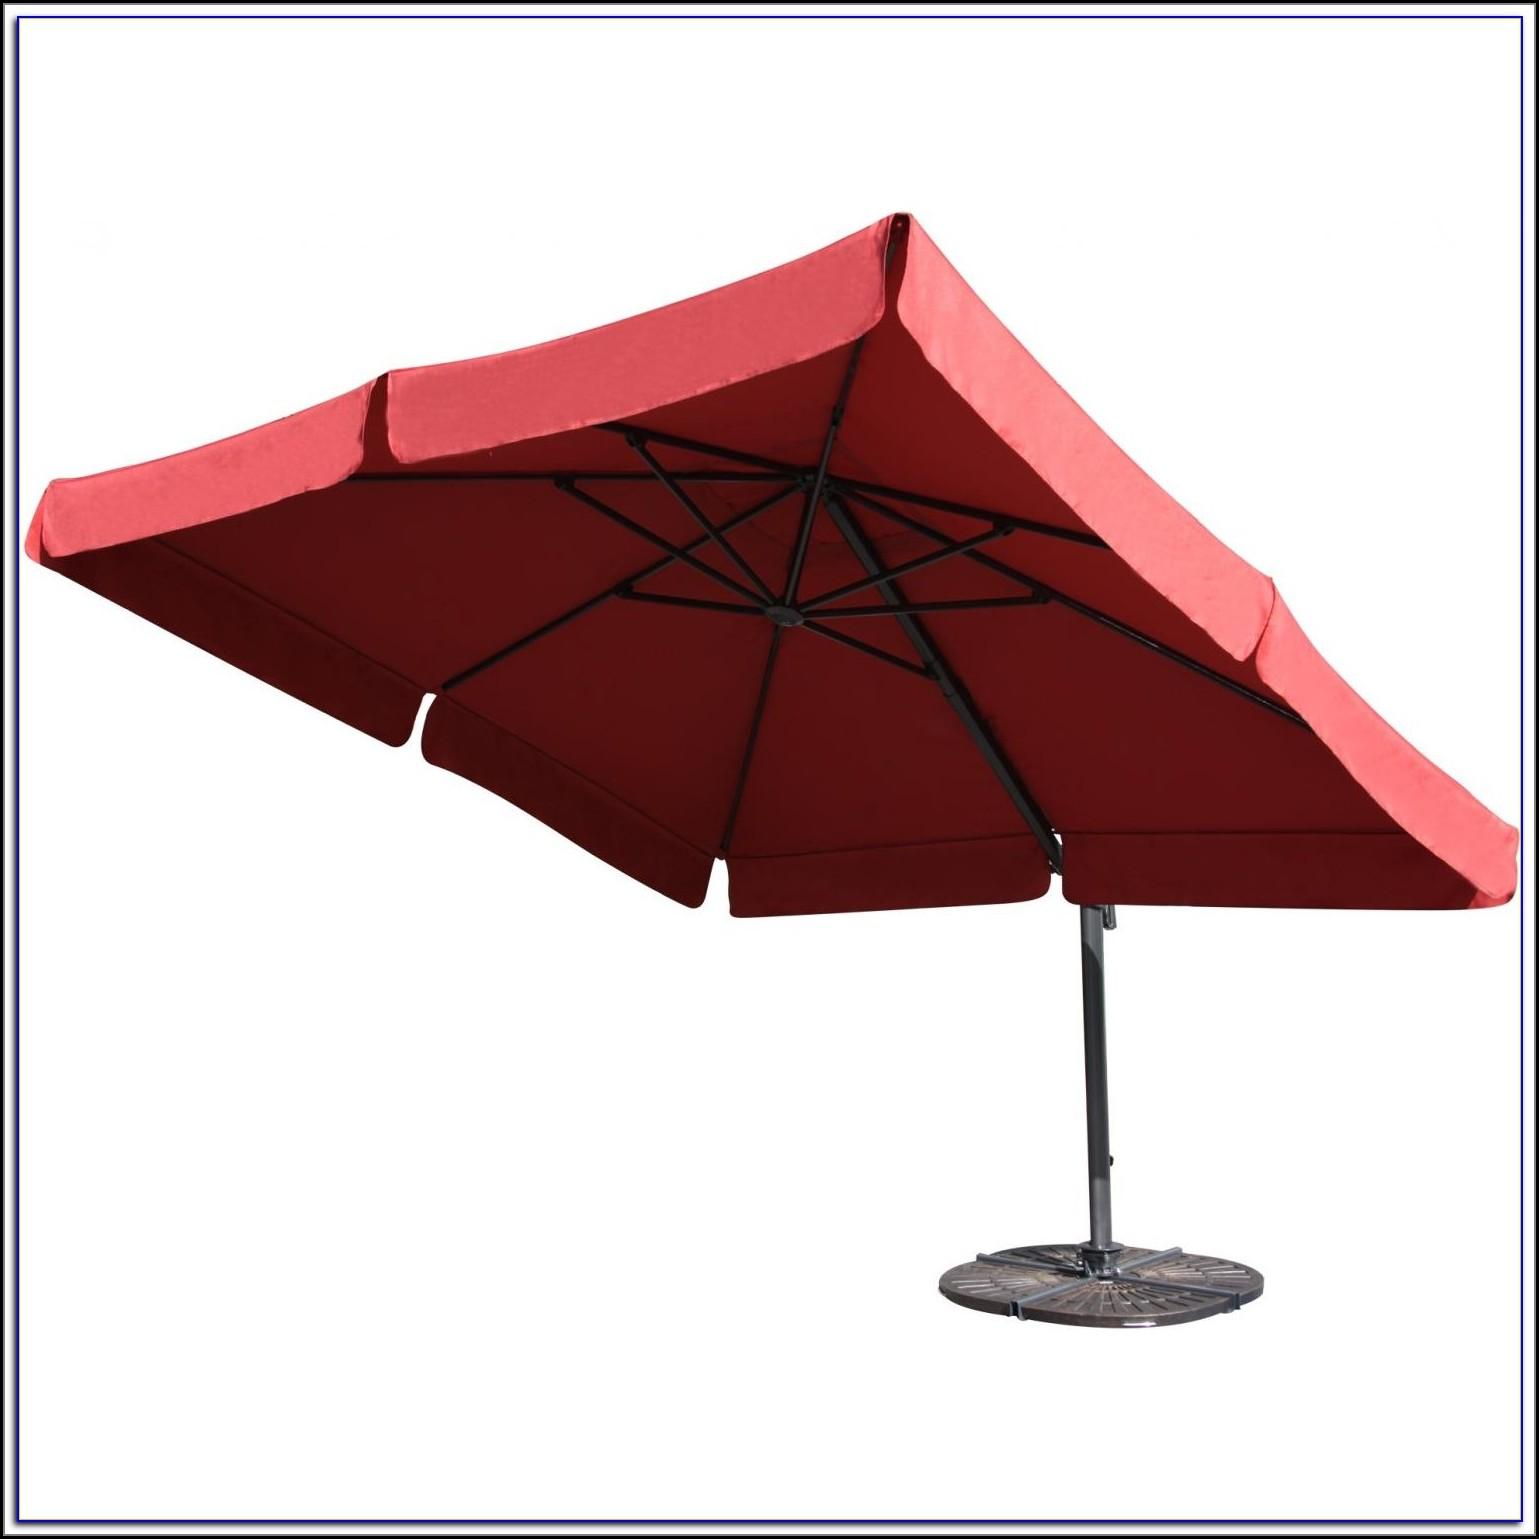 Portofino 10 Square Offset Patio Umbrella